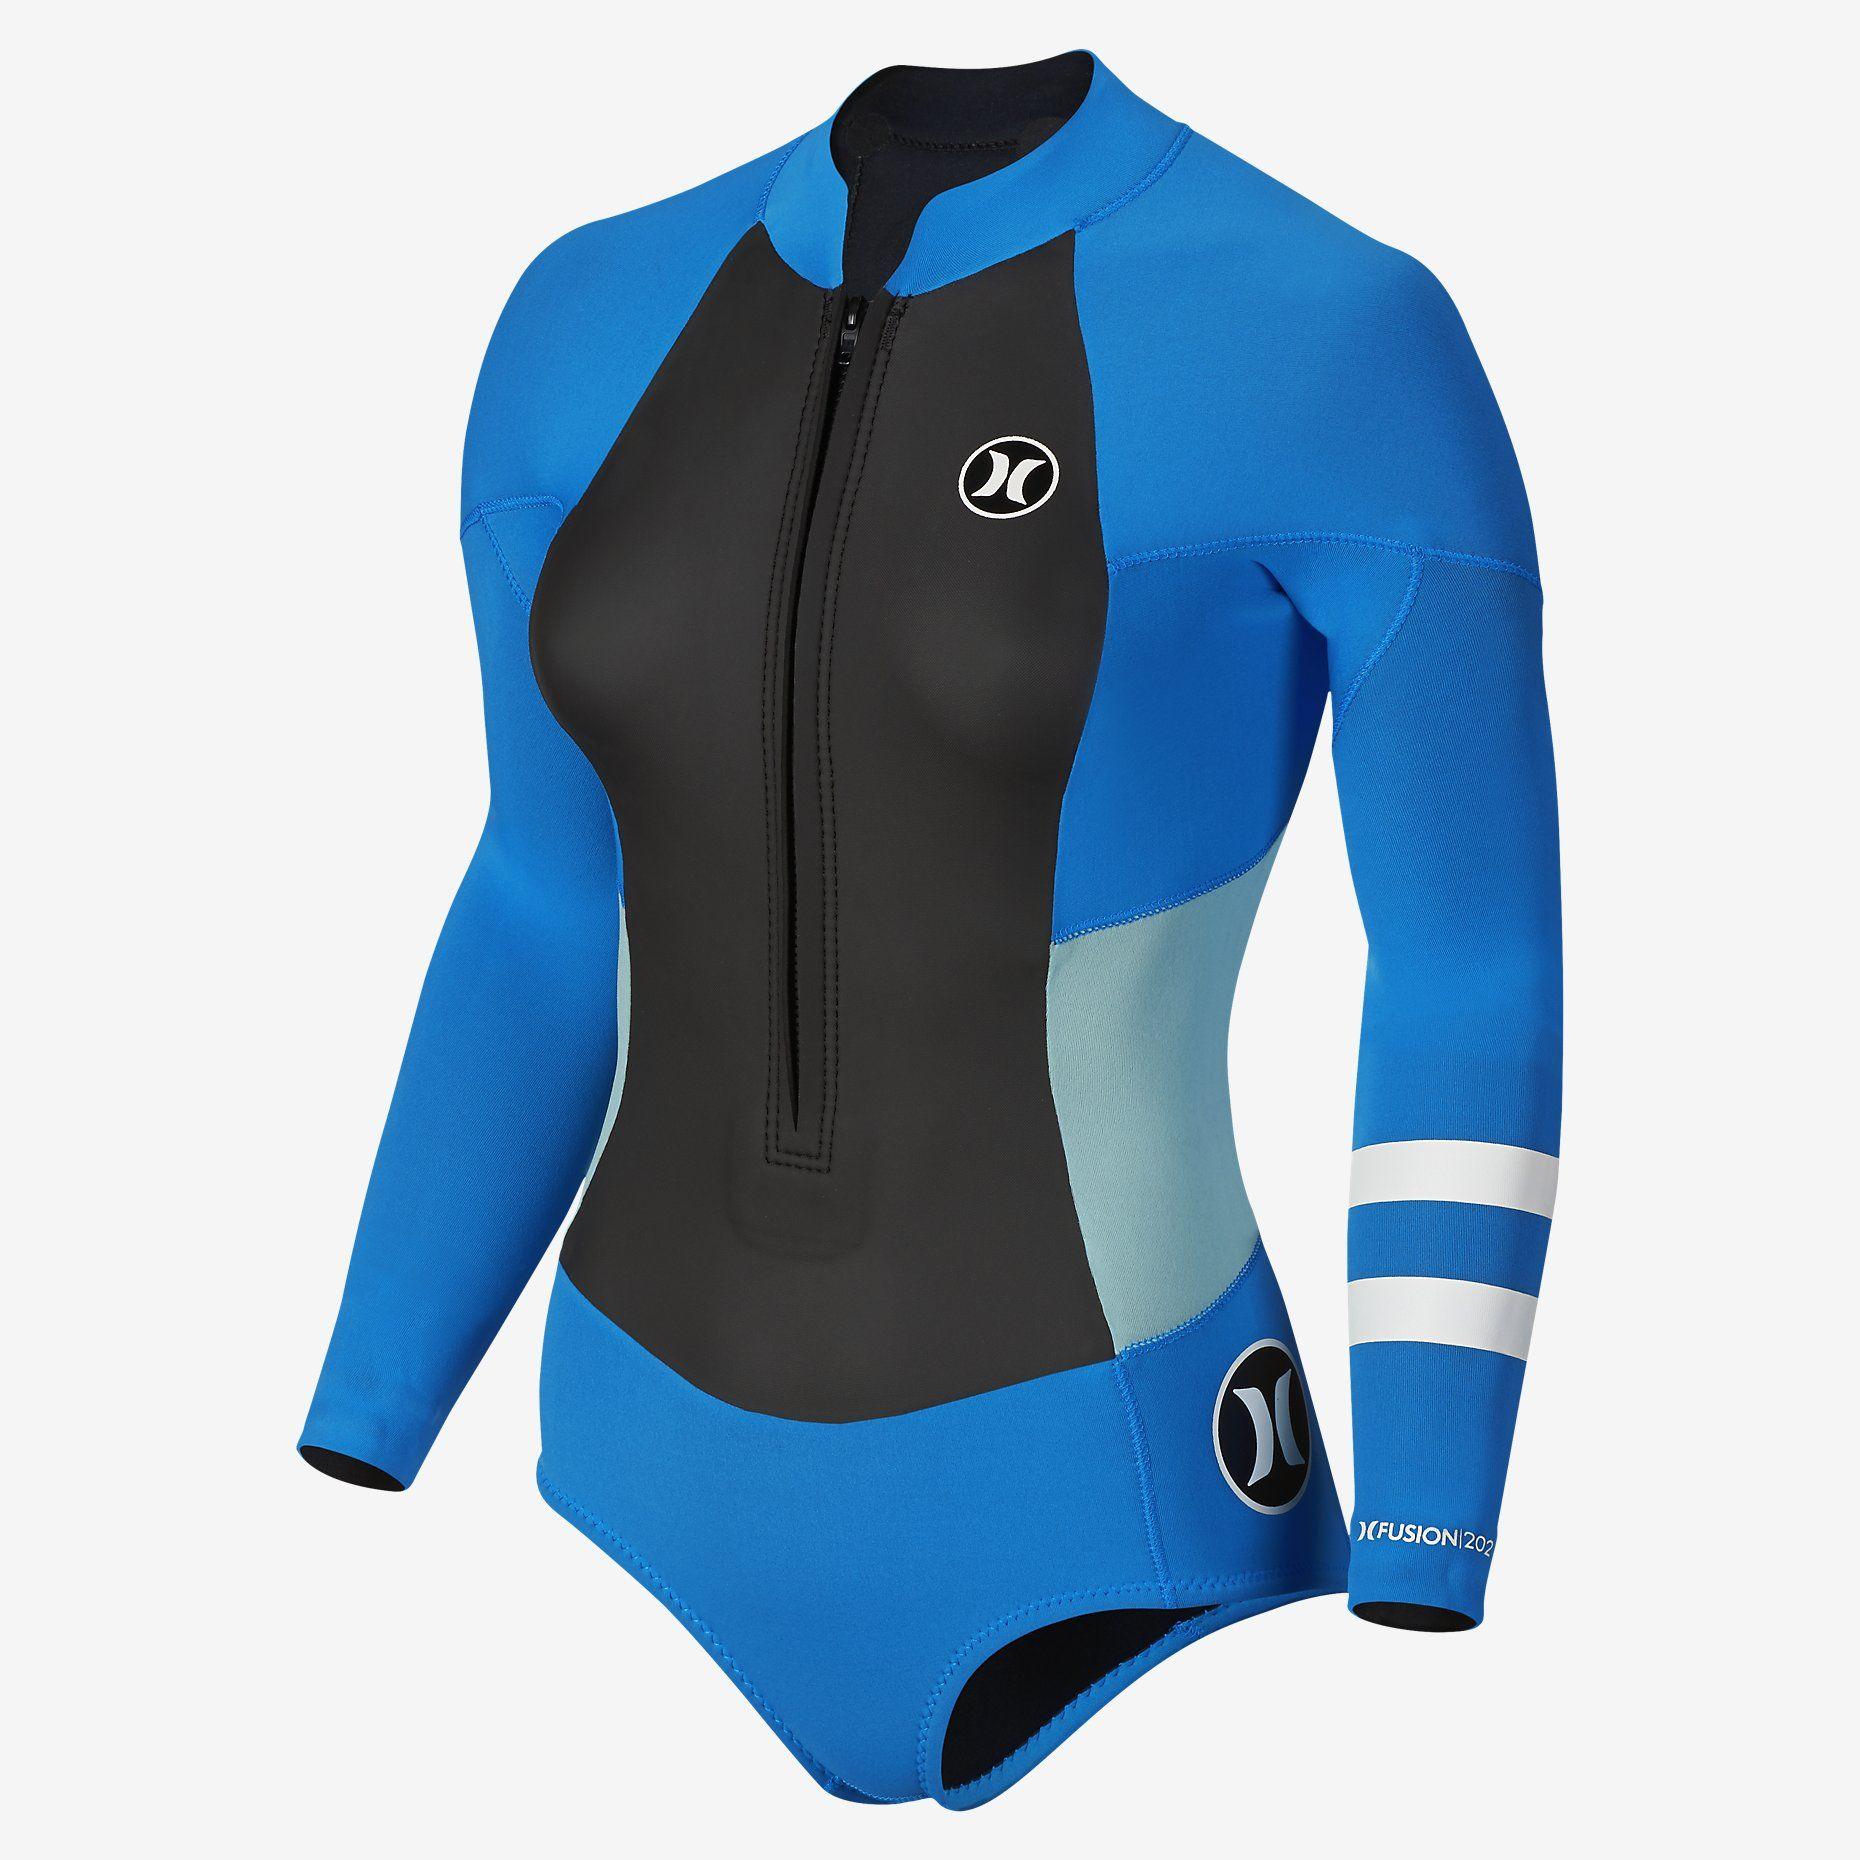 62b0778957 Hurley Fusion 202 Front Zip Springsuit Women s Wetsuit. Nike Store ...